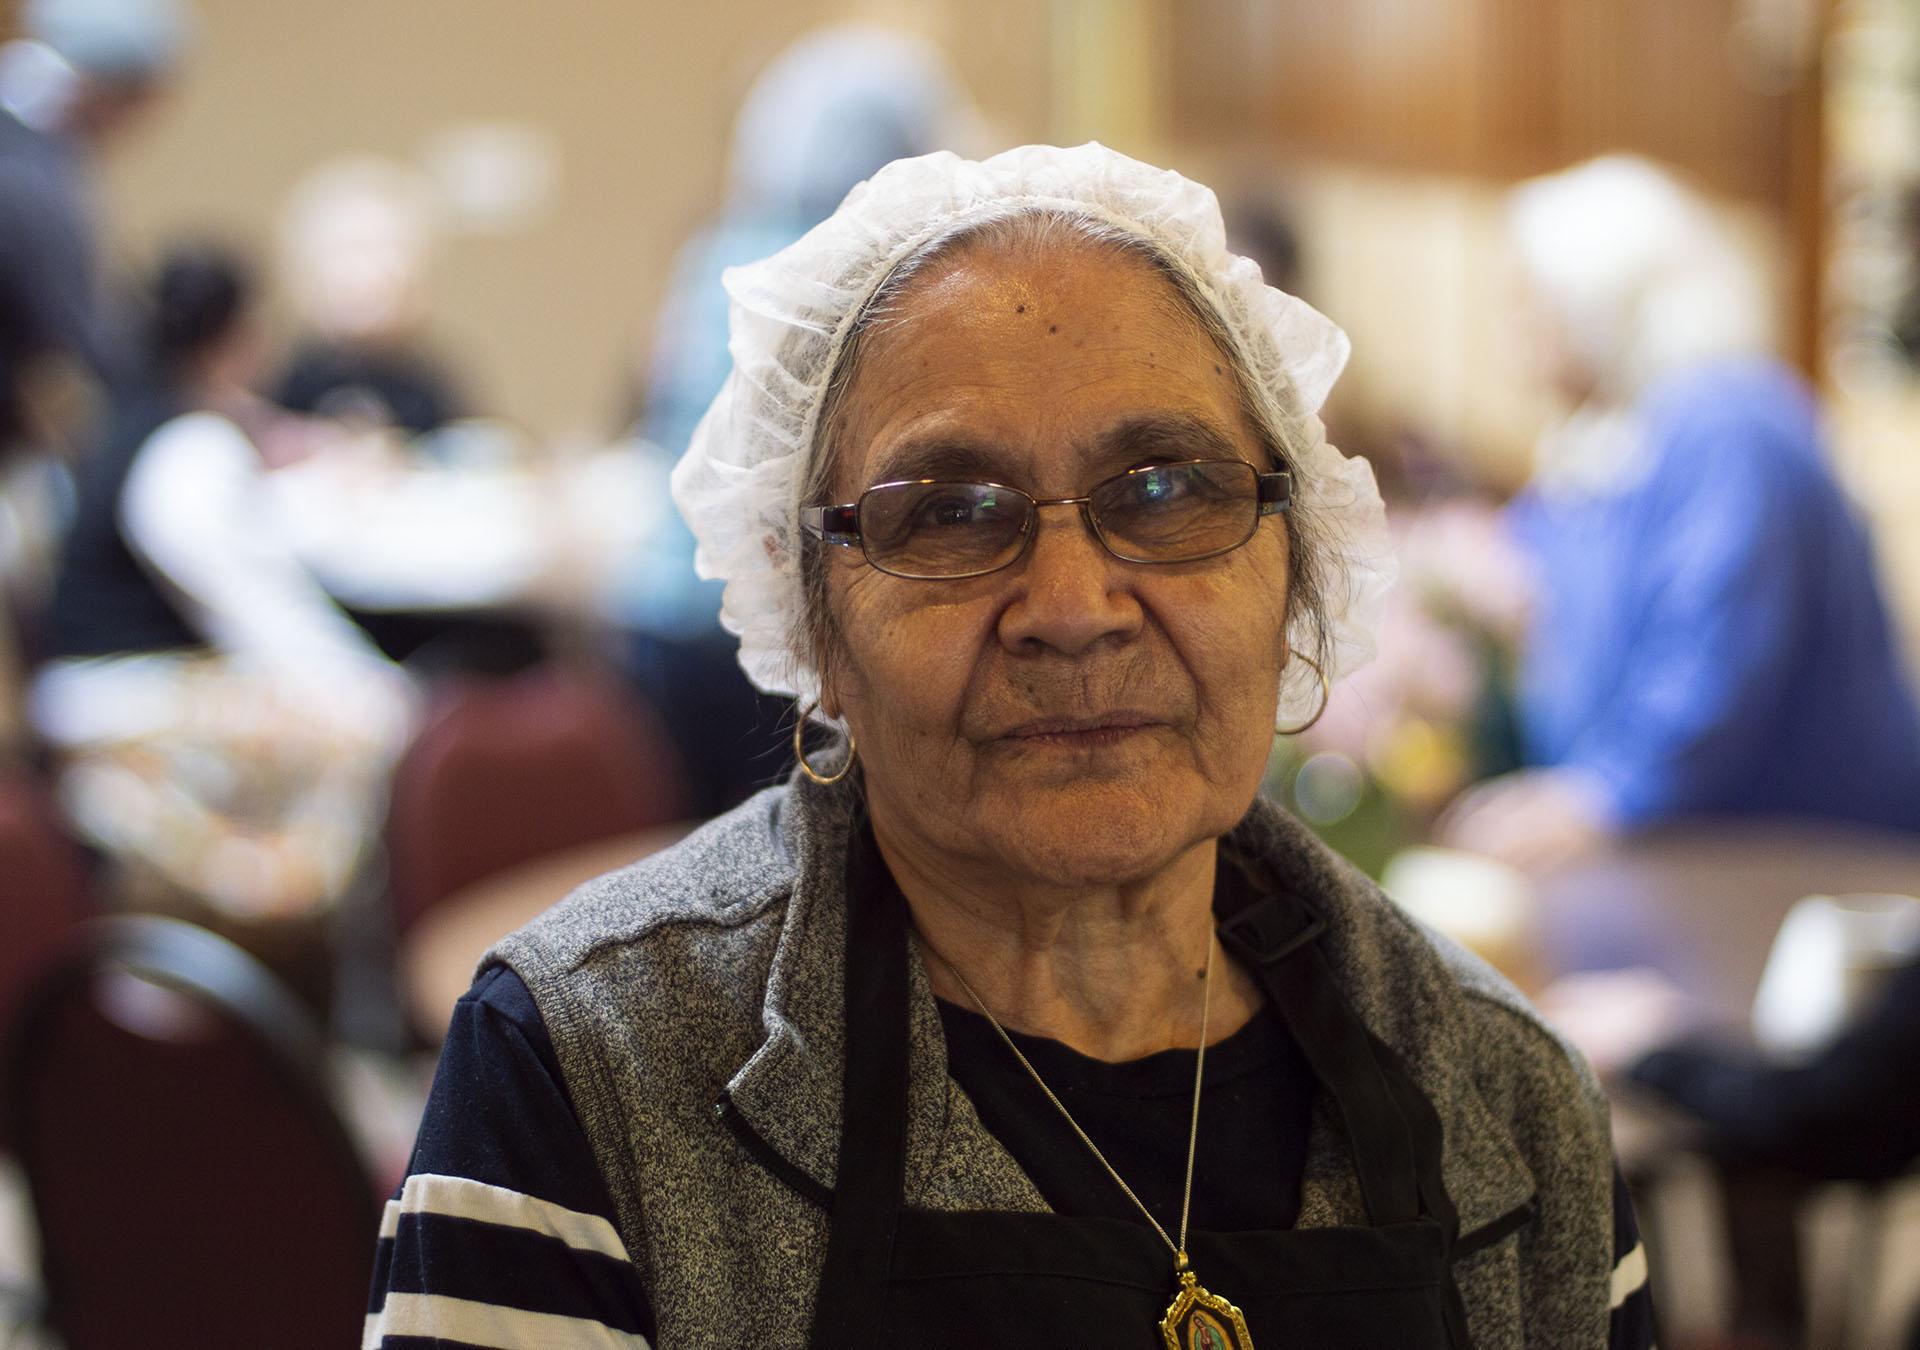 Older female volunteering at the Winter Shelter